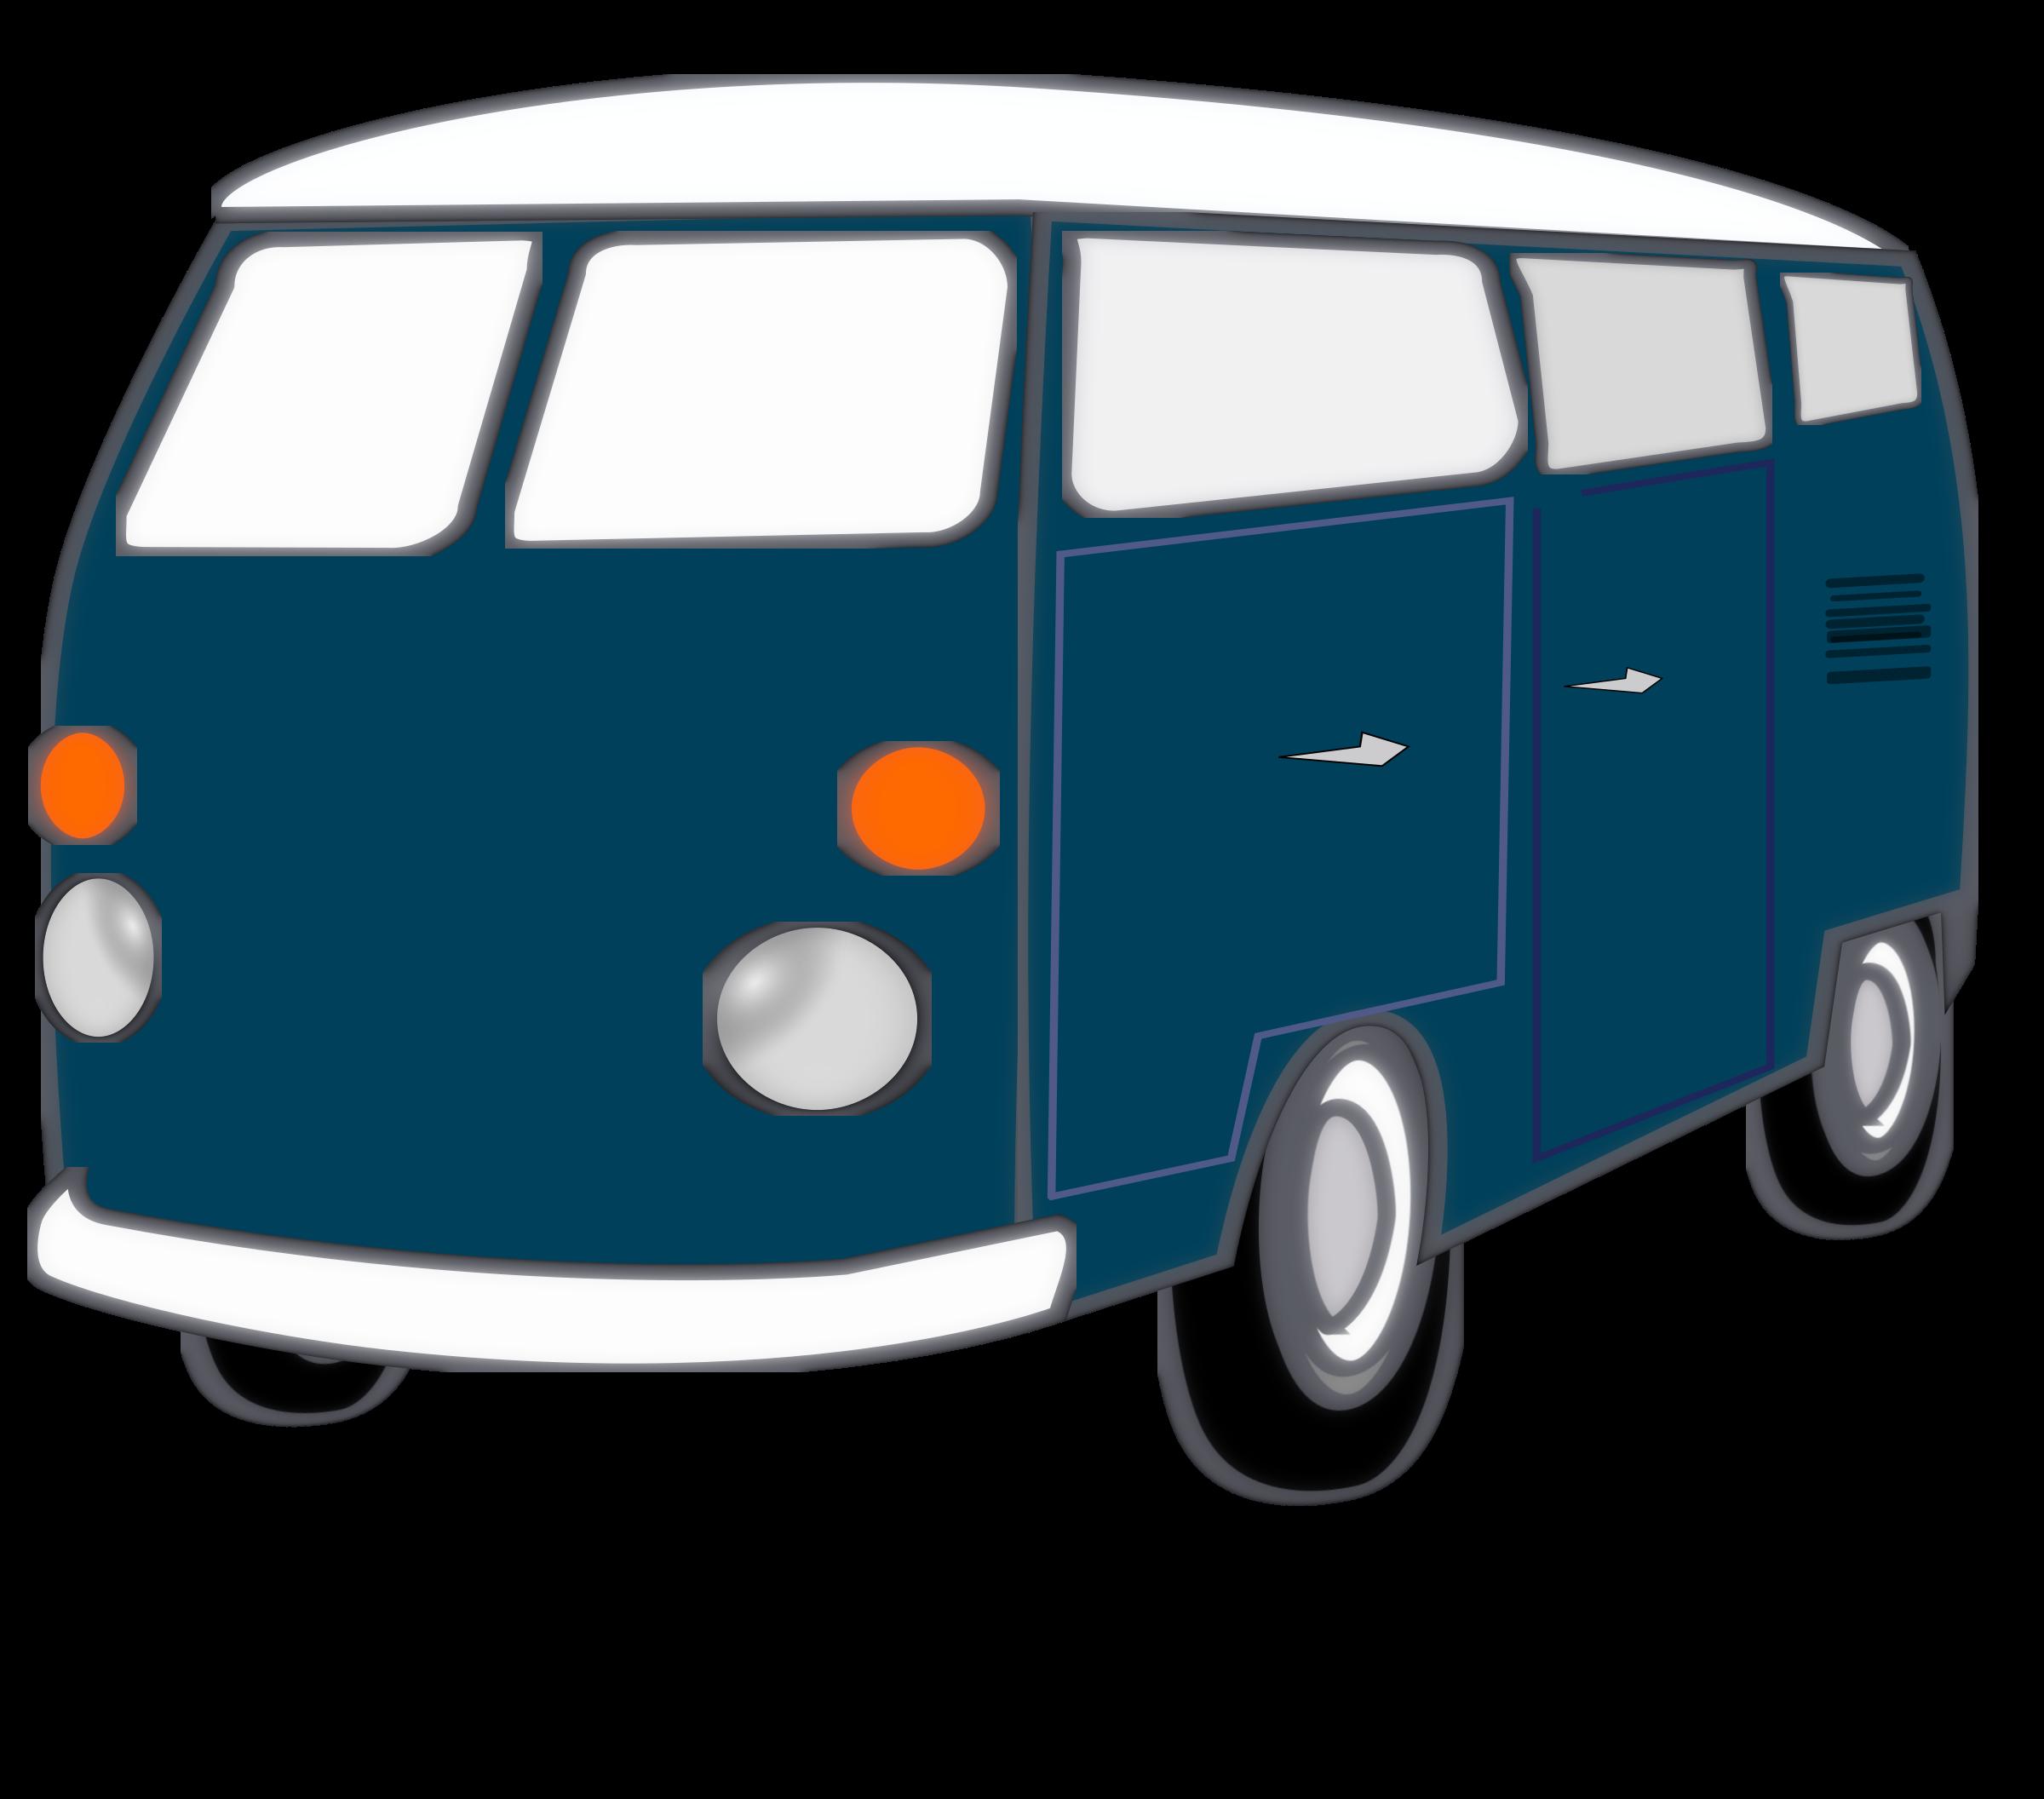 Minivan clipart carpool. Vans small free on